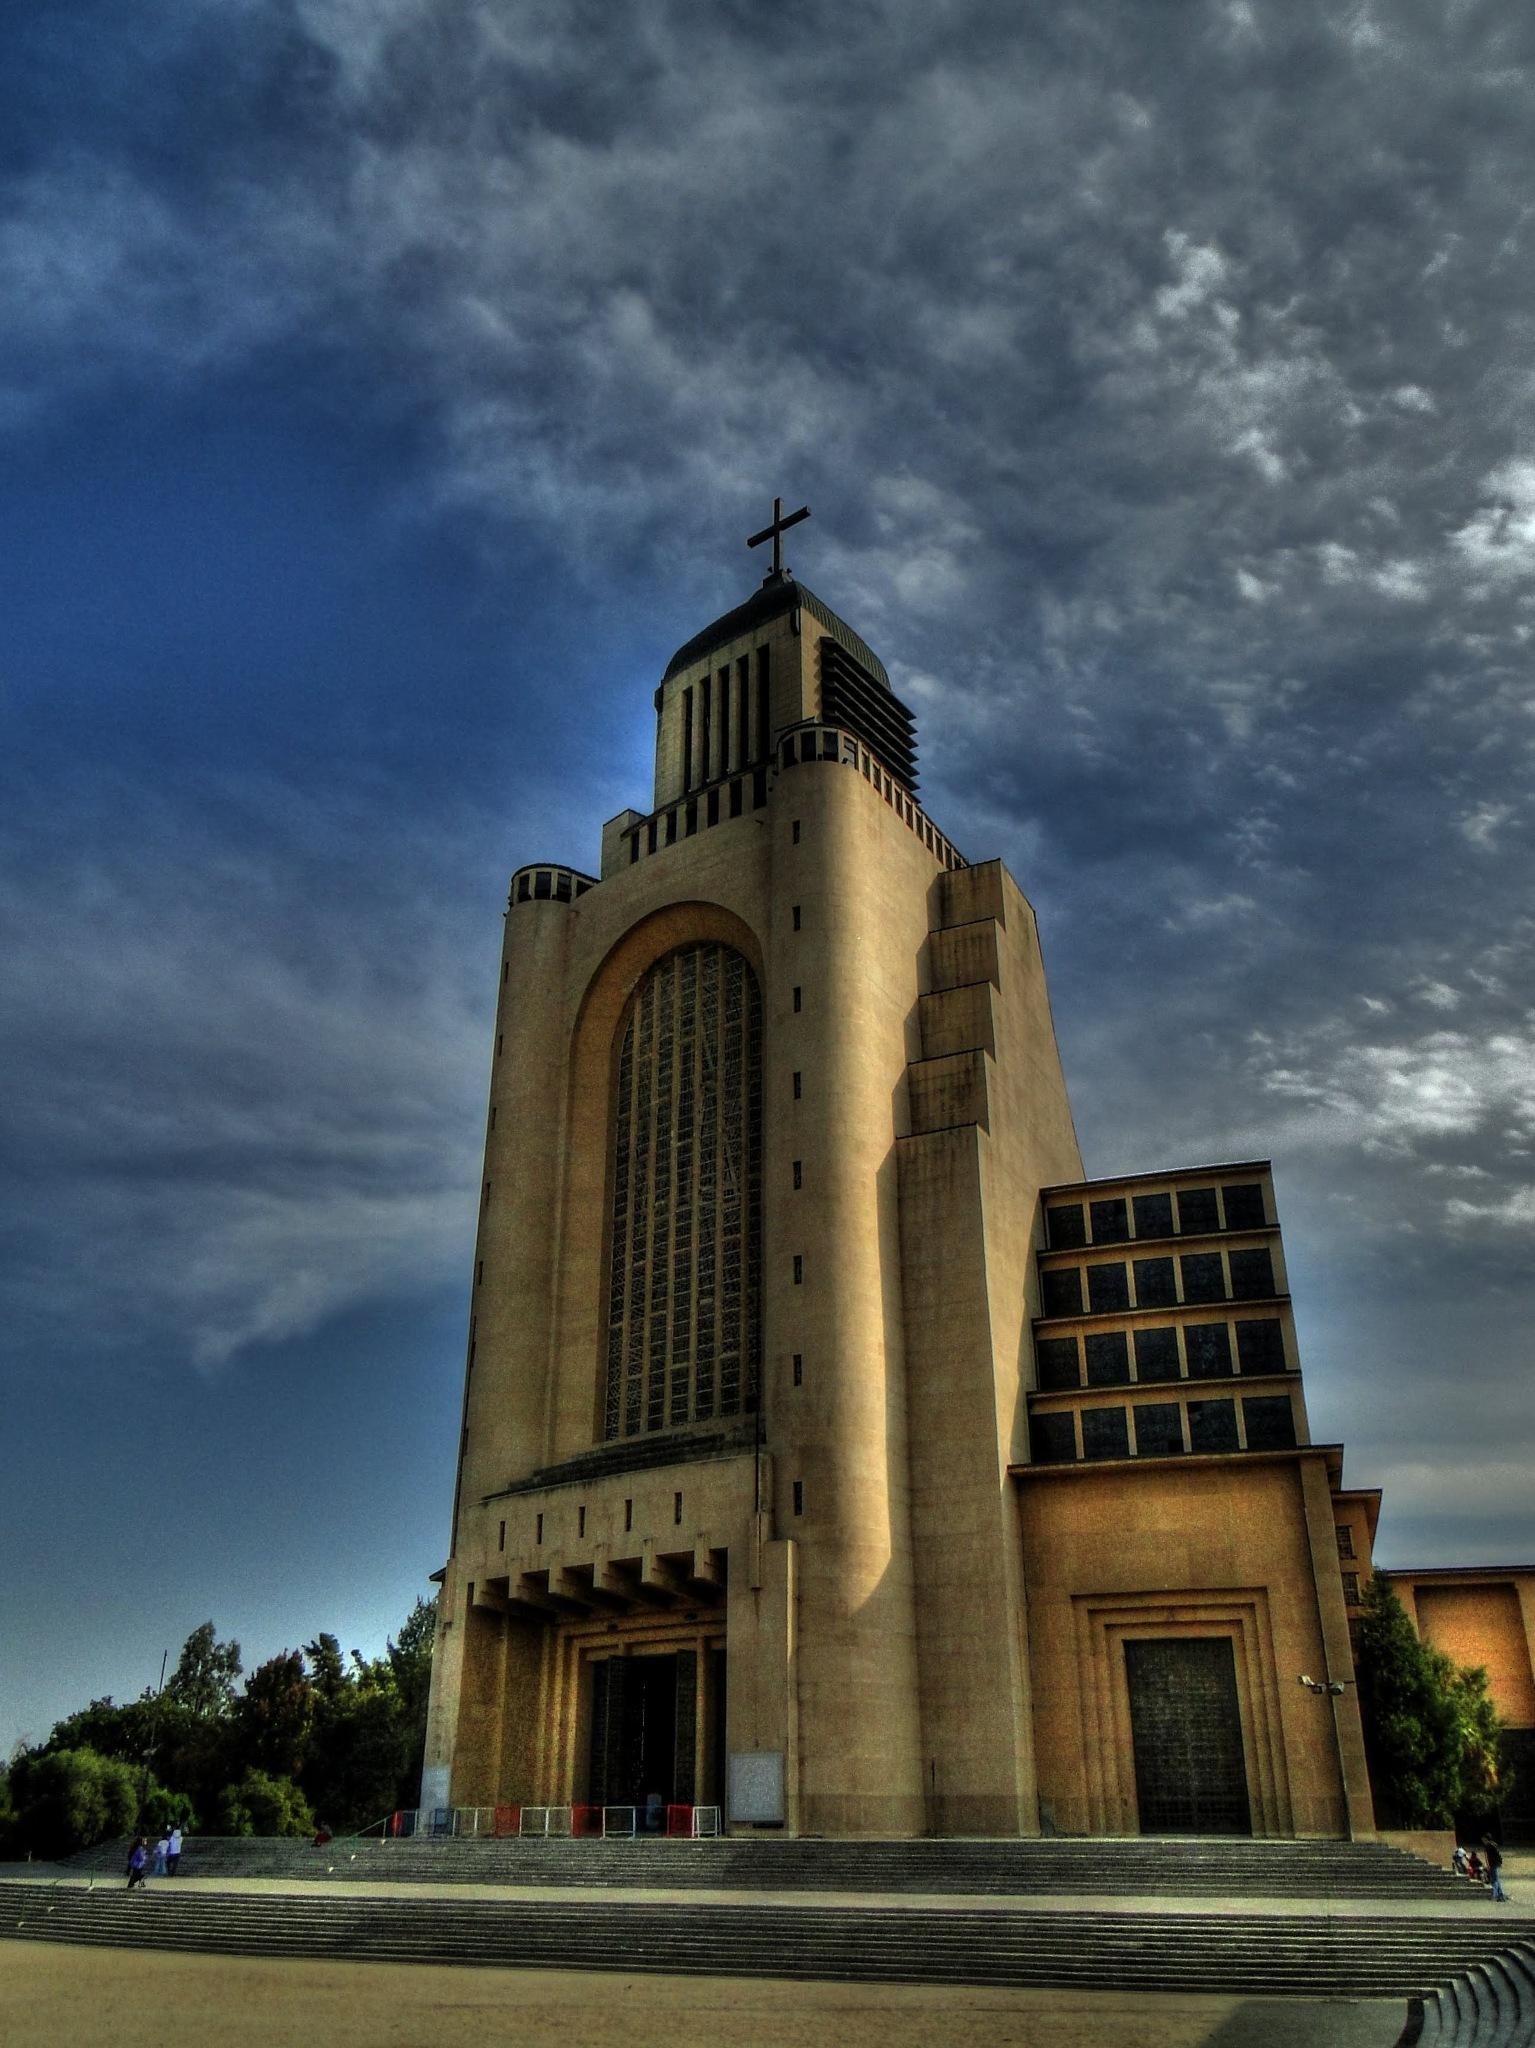 (0050) Templo Votivo de Maipú, RM de Santiago, Chile by Patricio Cabezas